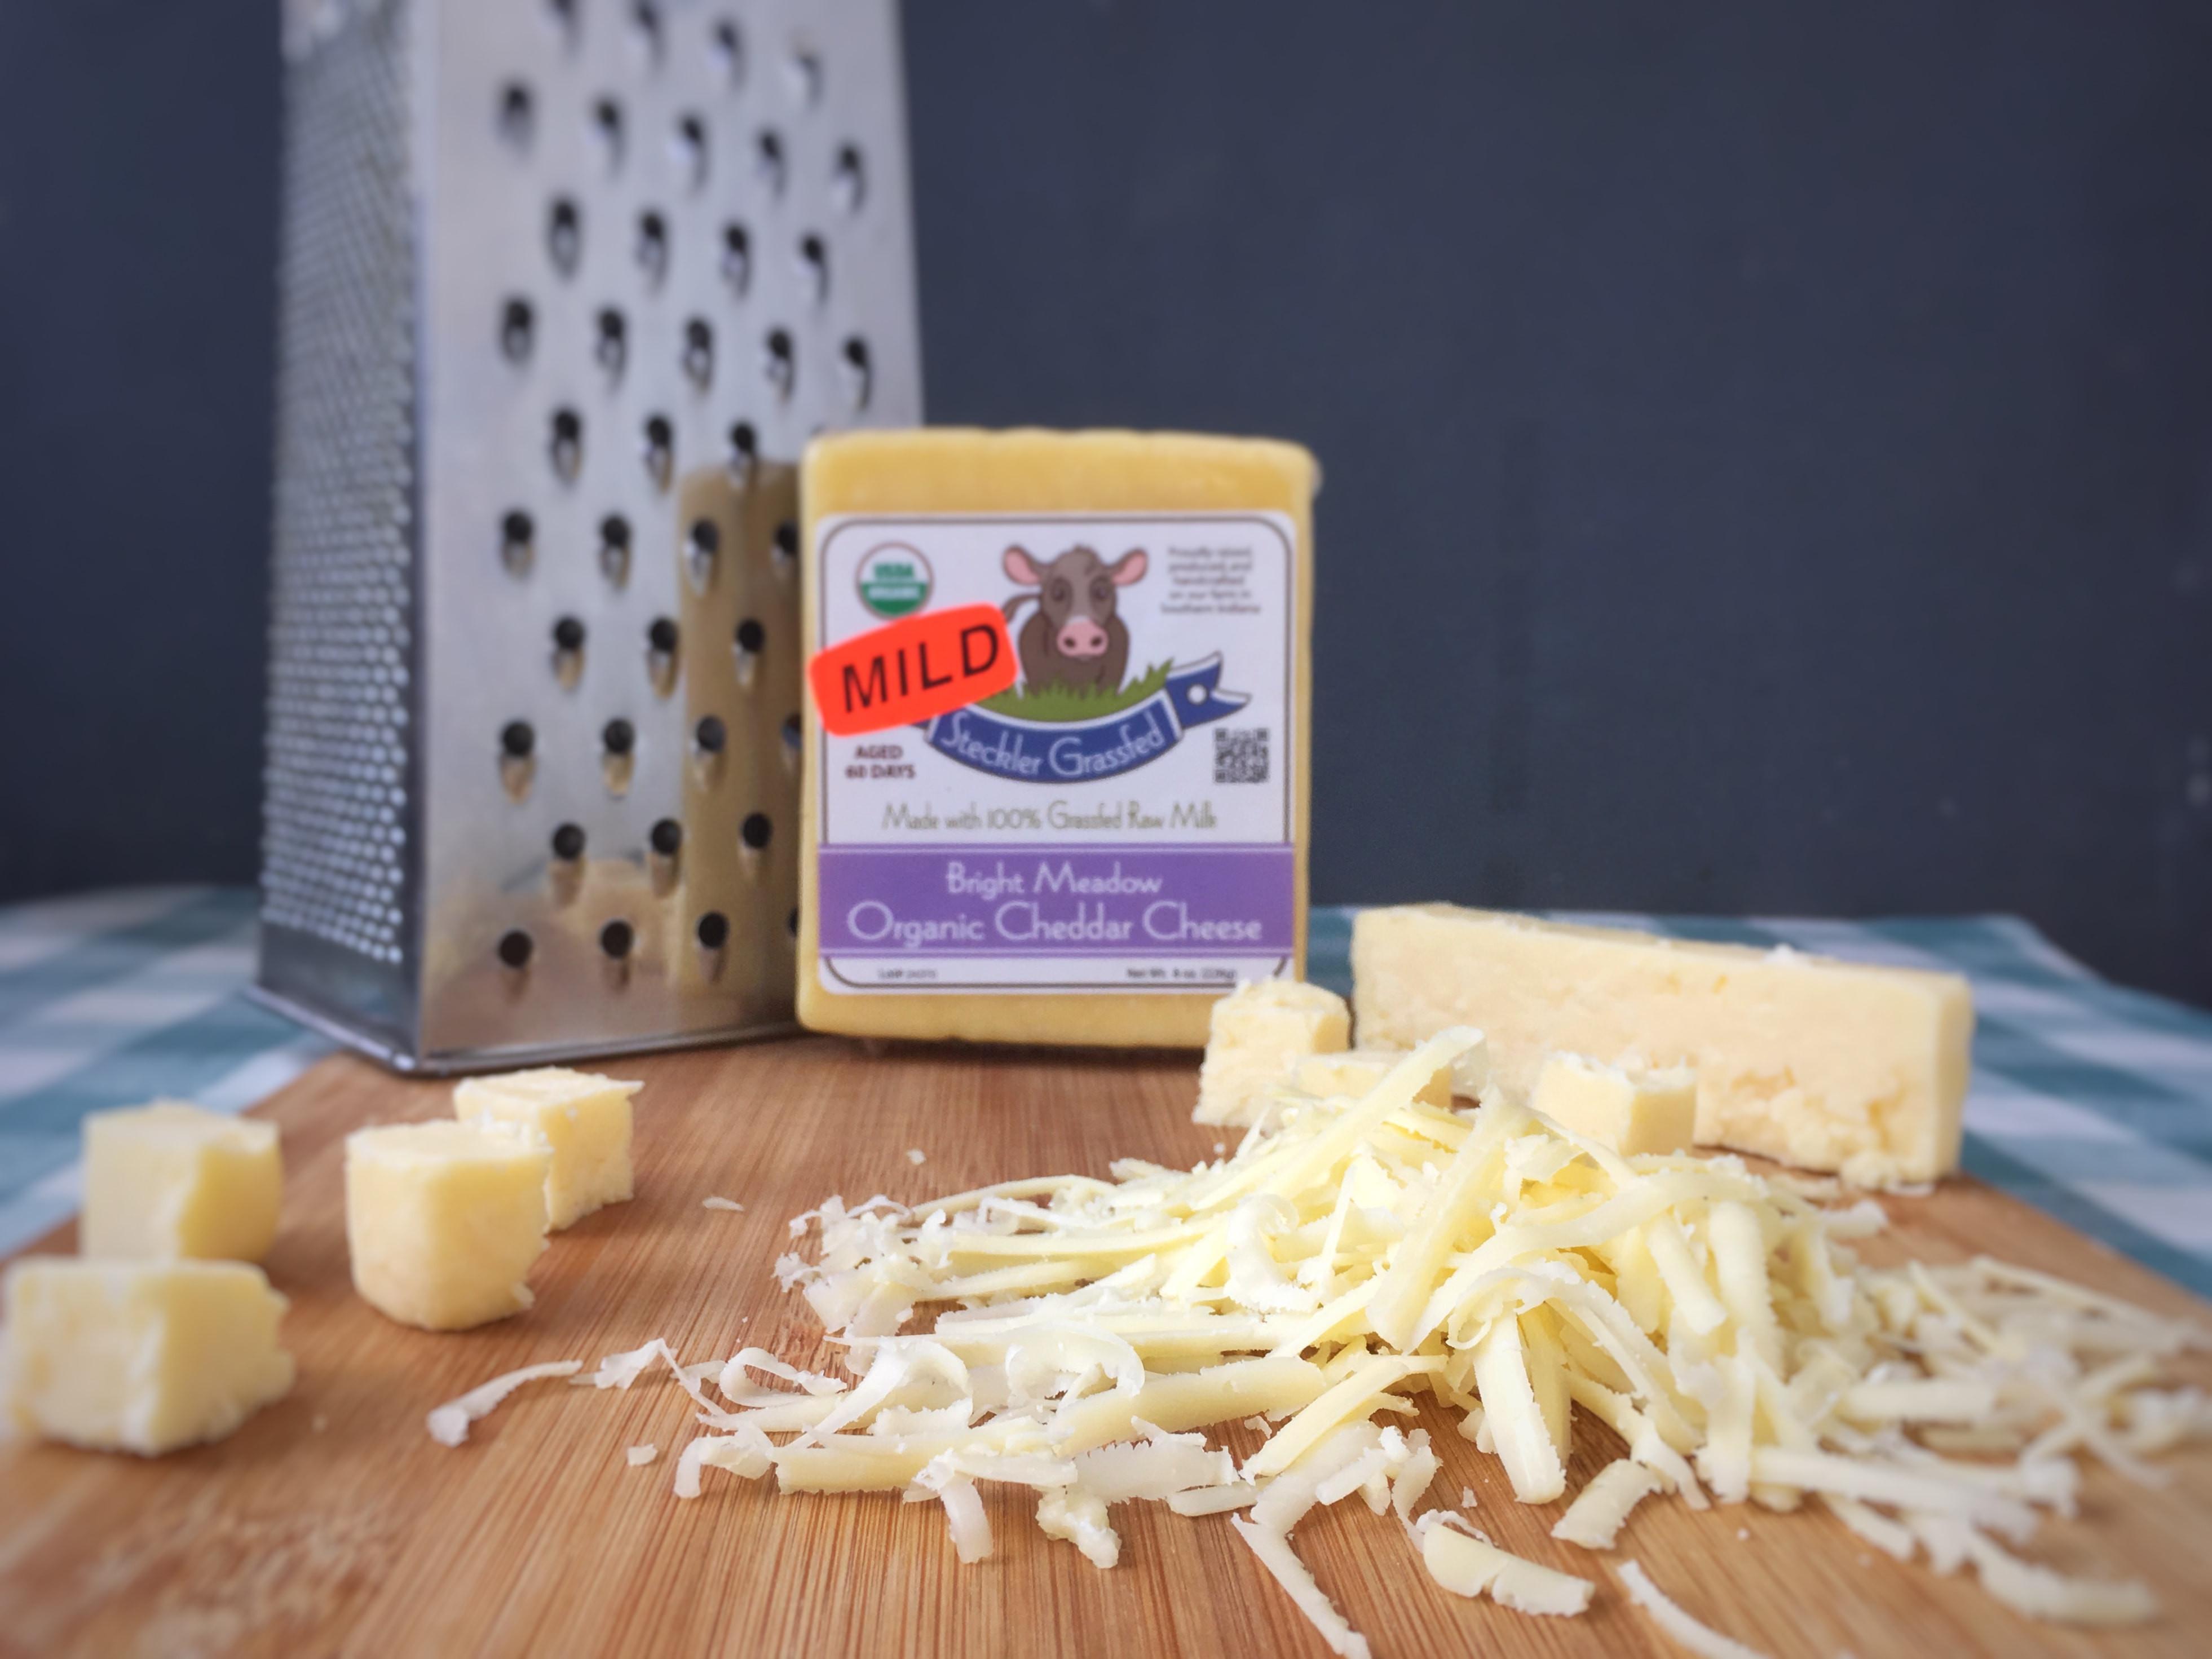 Cheese - Mild Cheddar